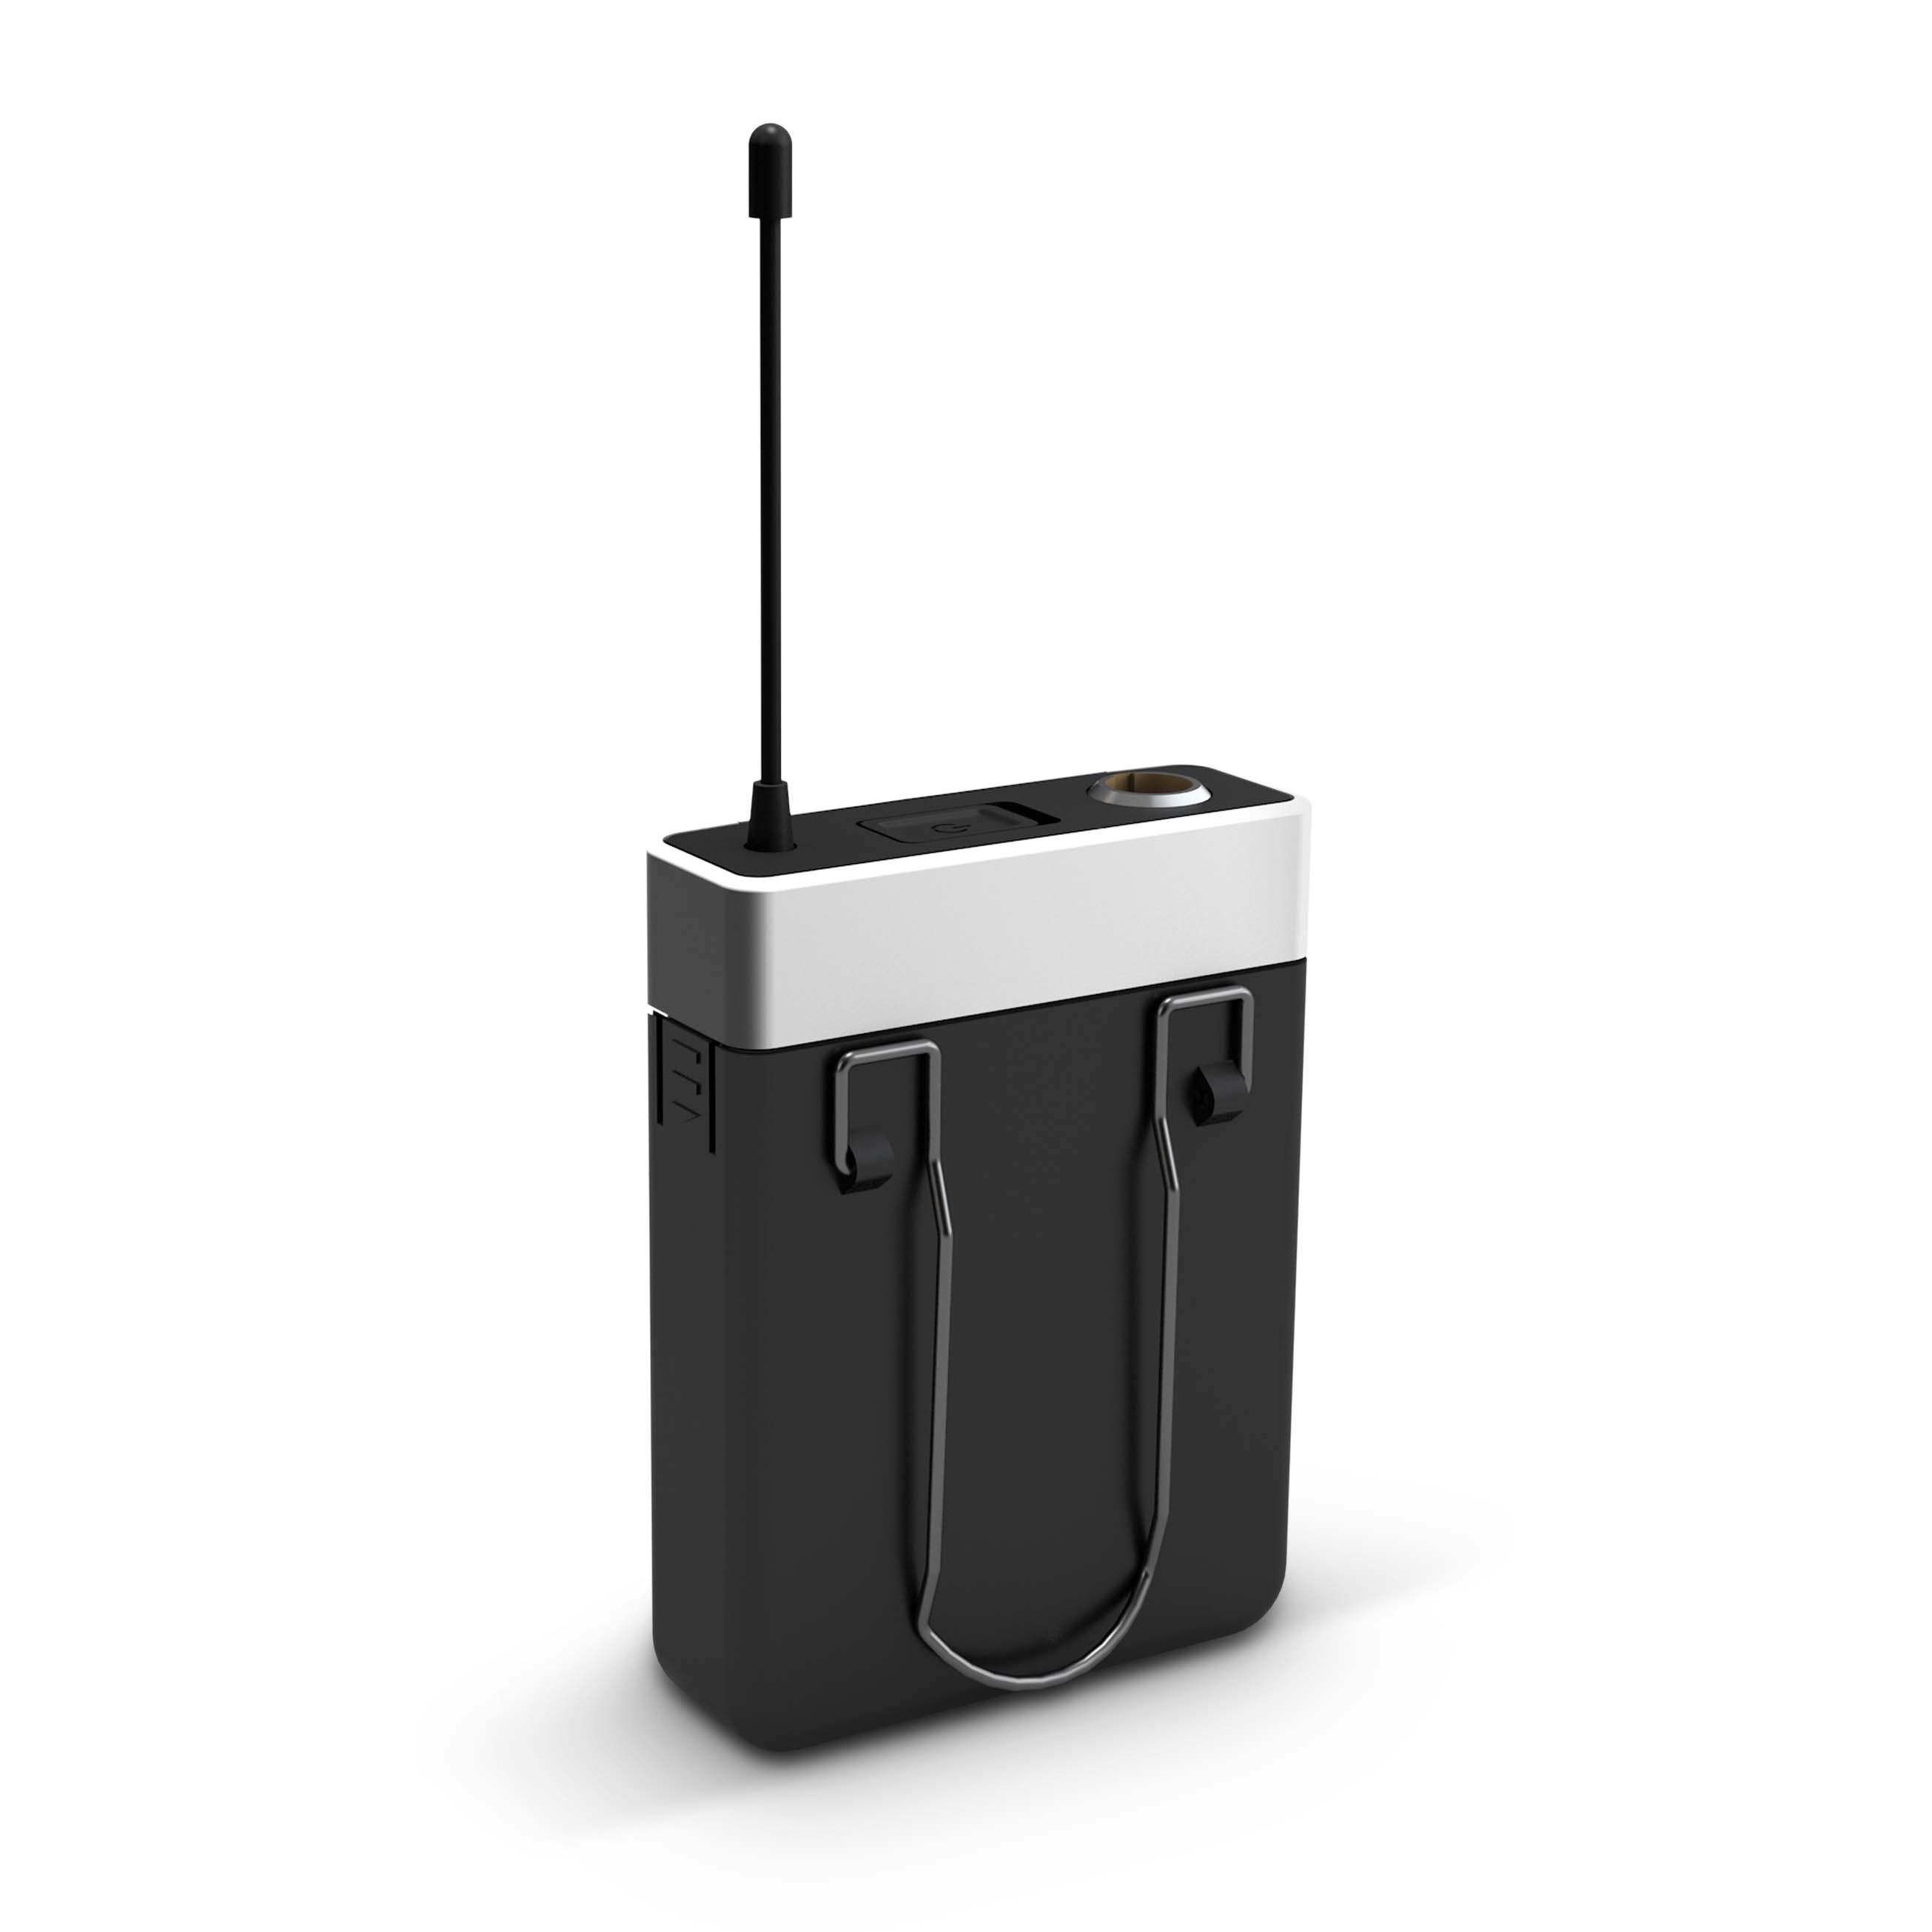 U508 BPG Funkmikrofon System mit Bodypack und Gitarren Kabel